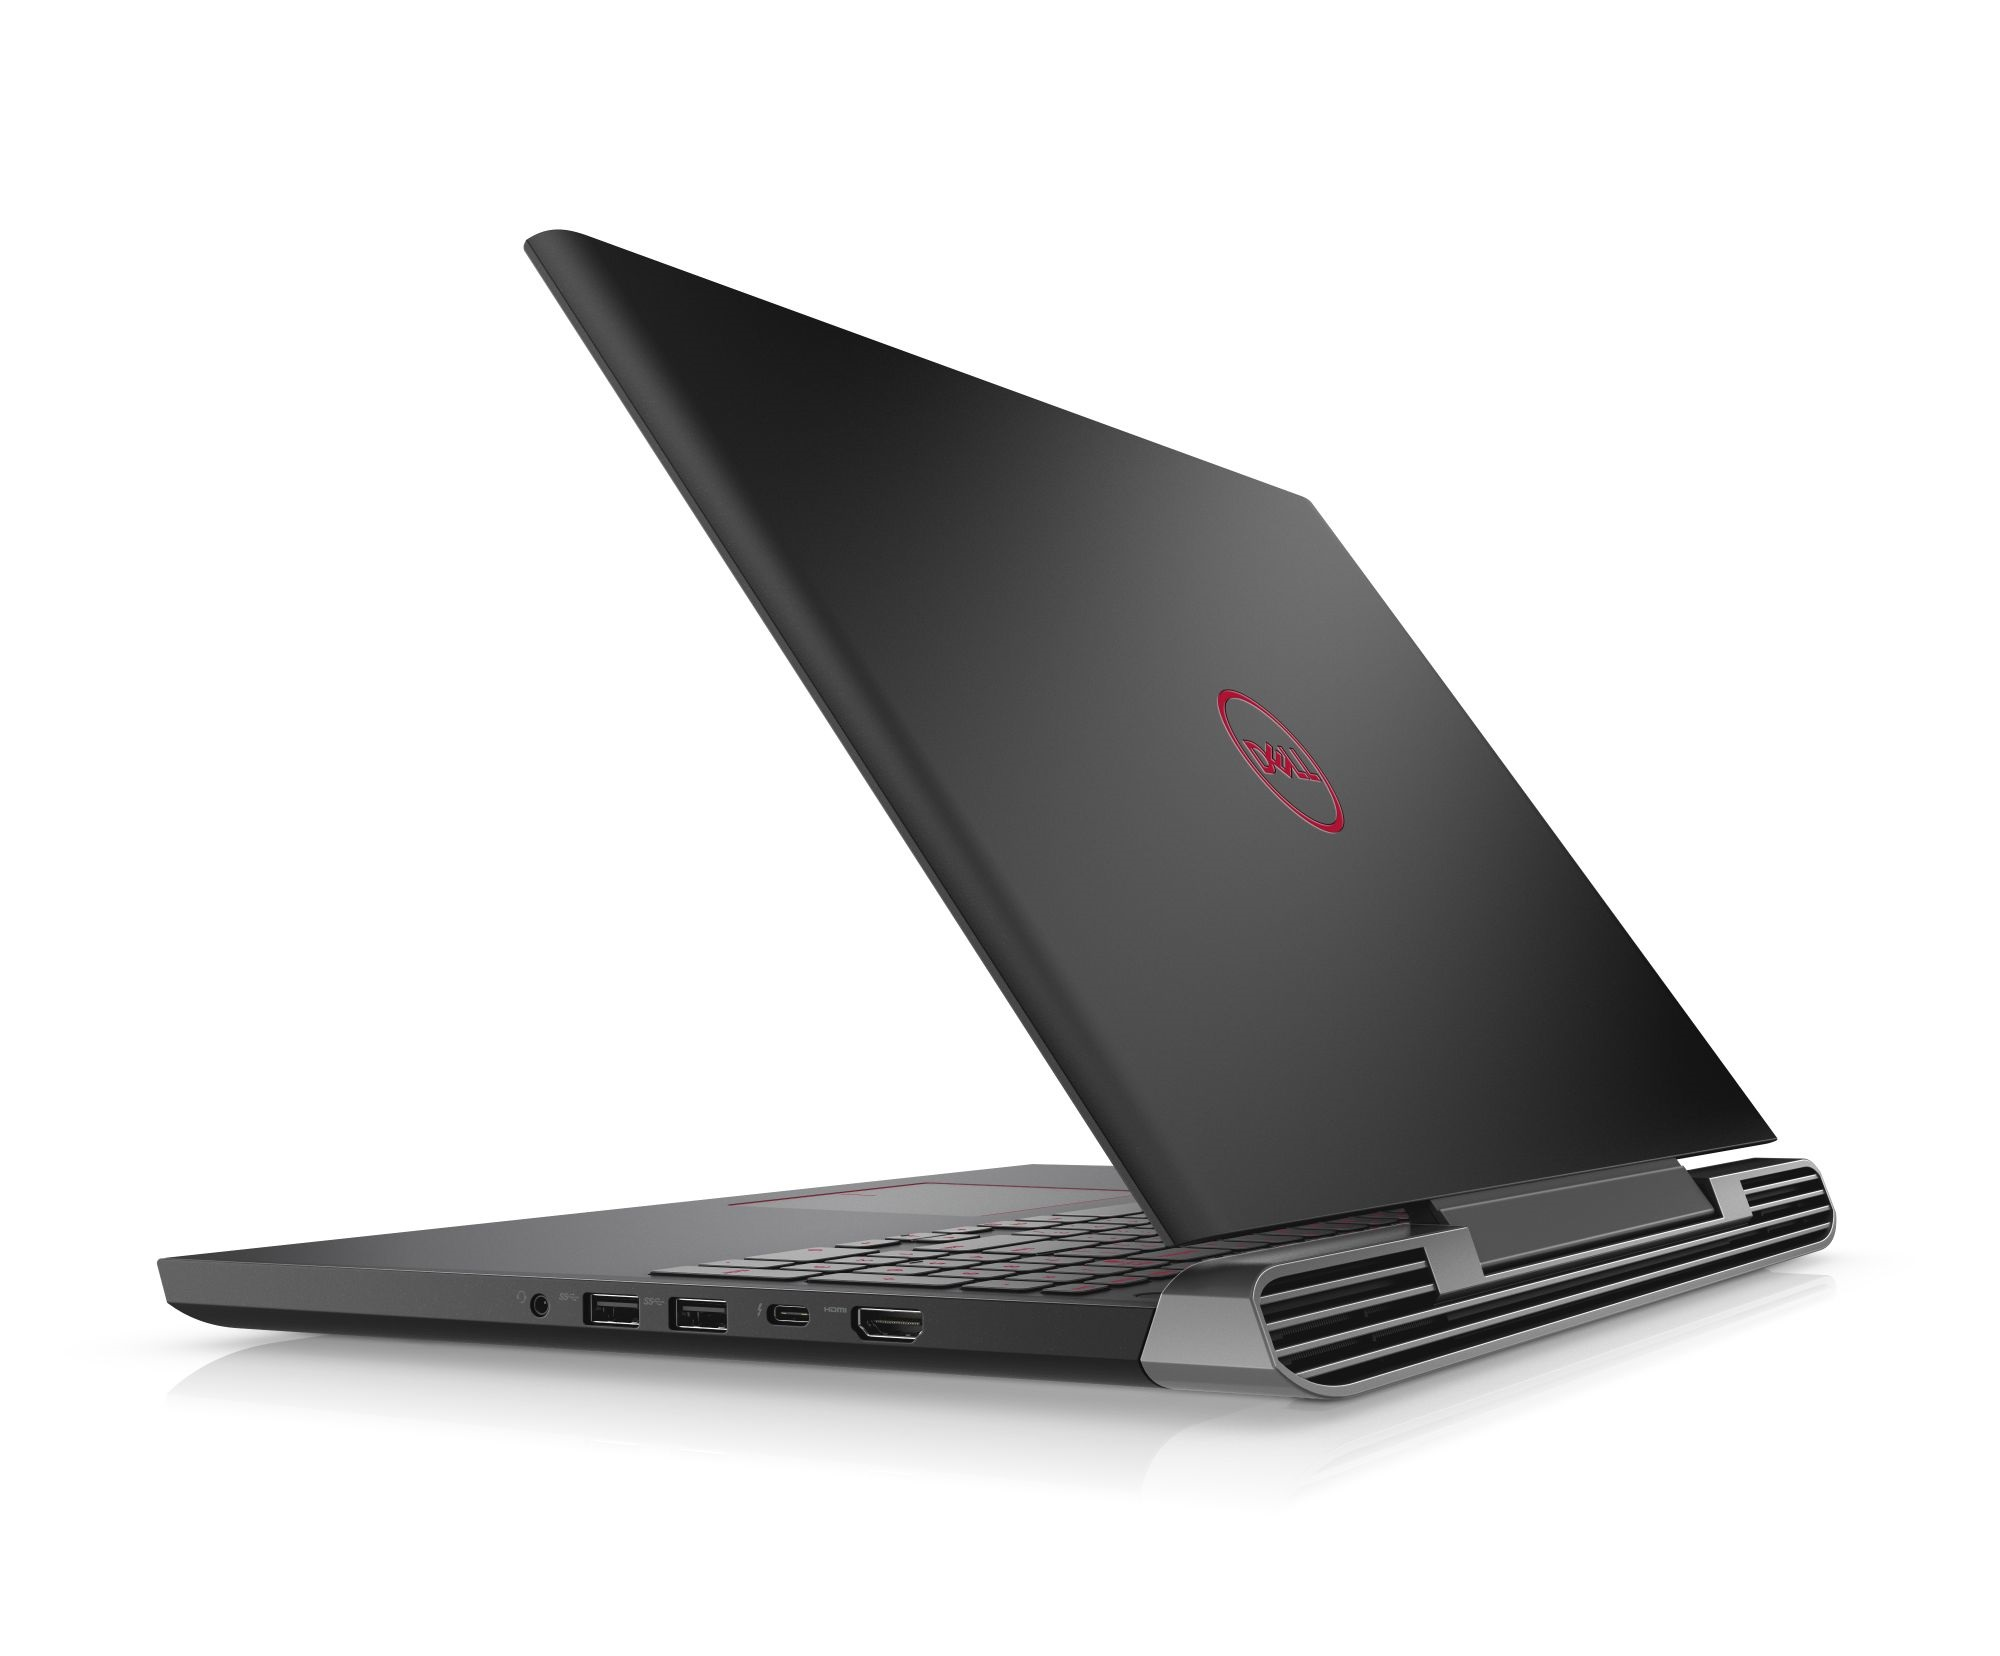 Dell Inspiron G5 5587 15 FHD i5-8300H/8GB/128GB SSD+1TB/1060-6GB/MCR/FPR/HDMI/THB/W10/2RNBD/Černý